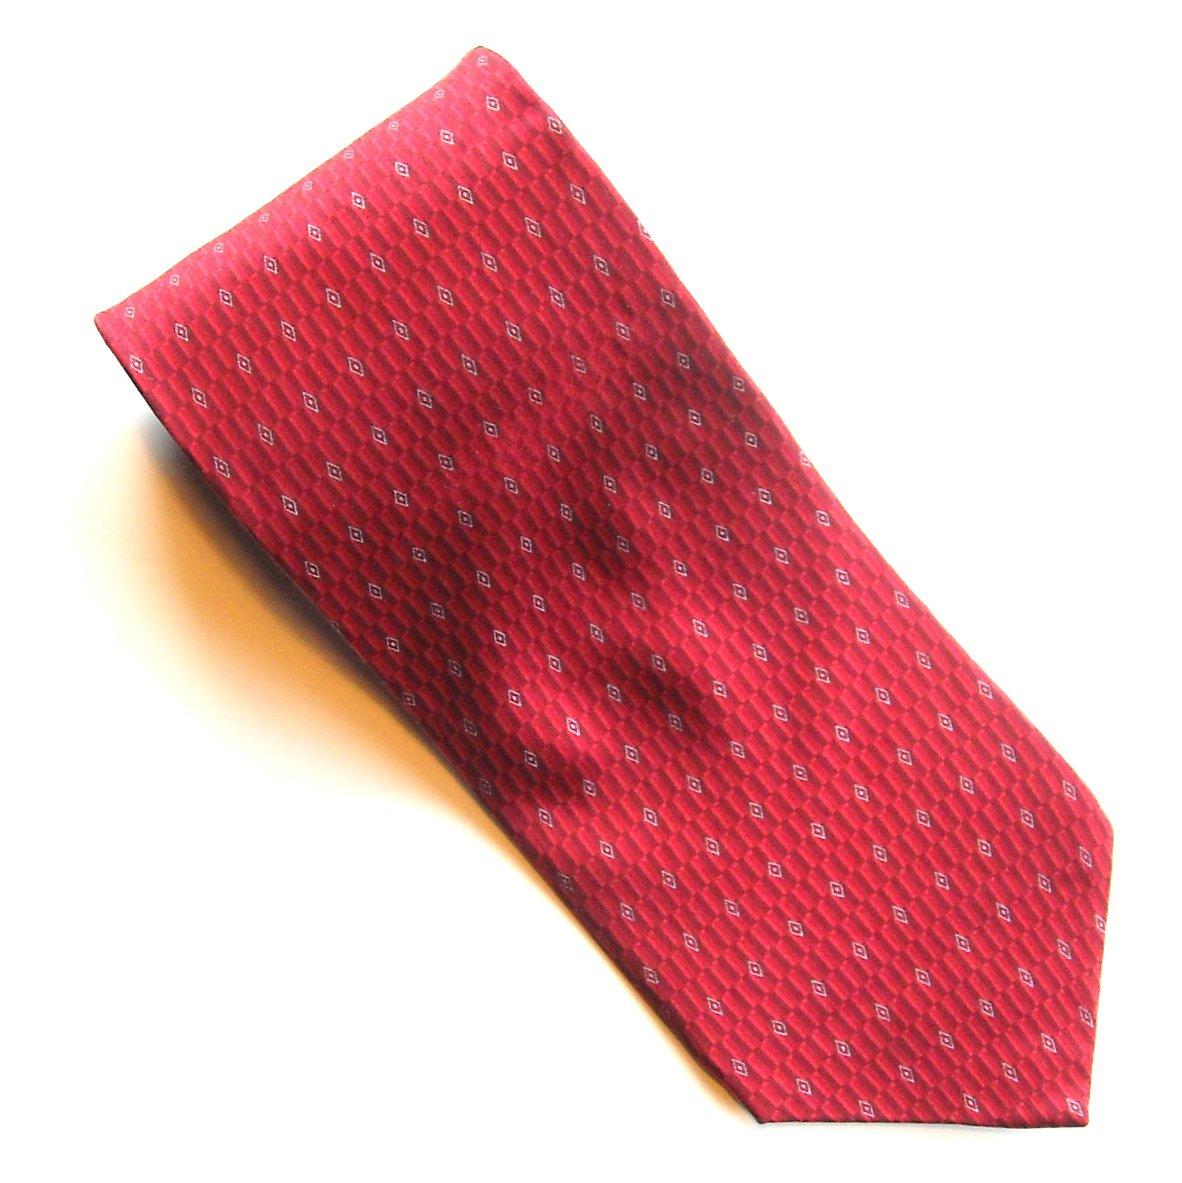 Murano Red Black Silver White Design mens 100% Silk necktie tie